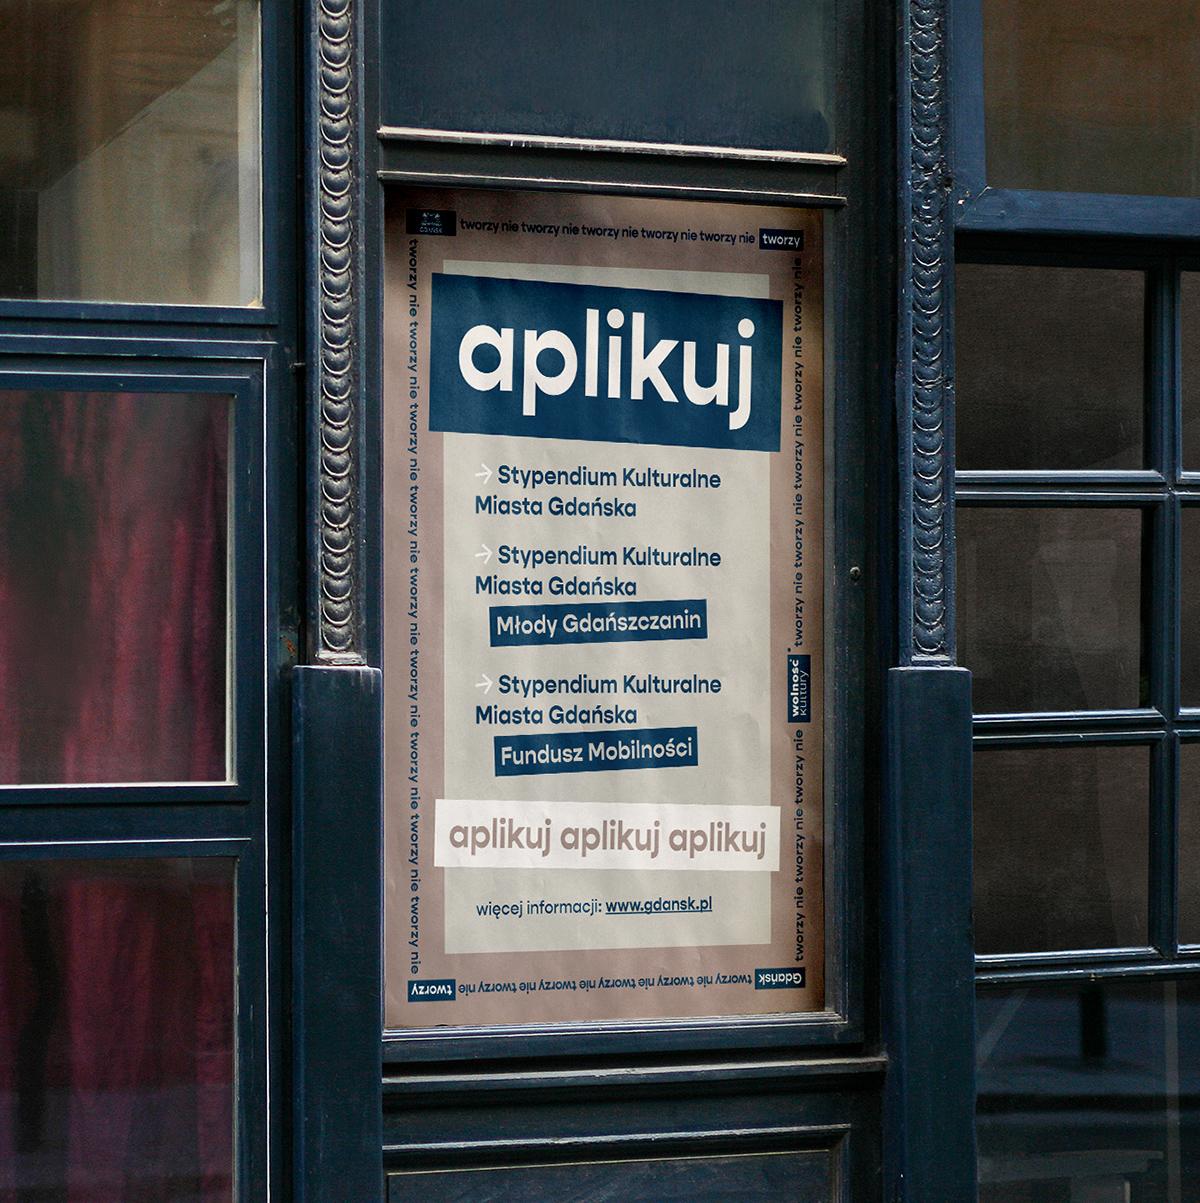 Urząd Miasto Gdańsk Instytucja Projekt kultura plakat